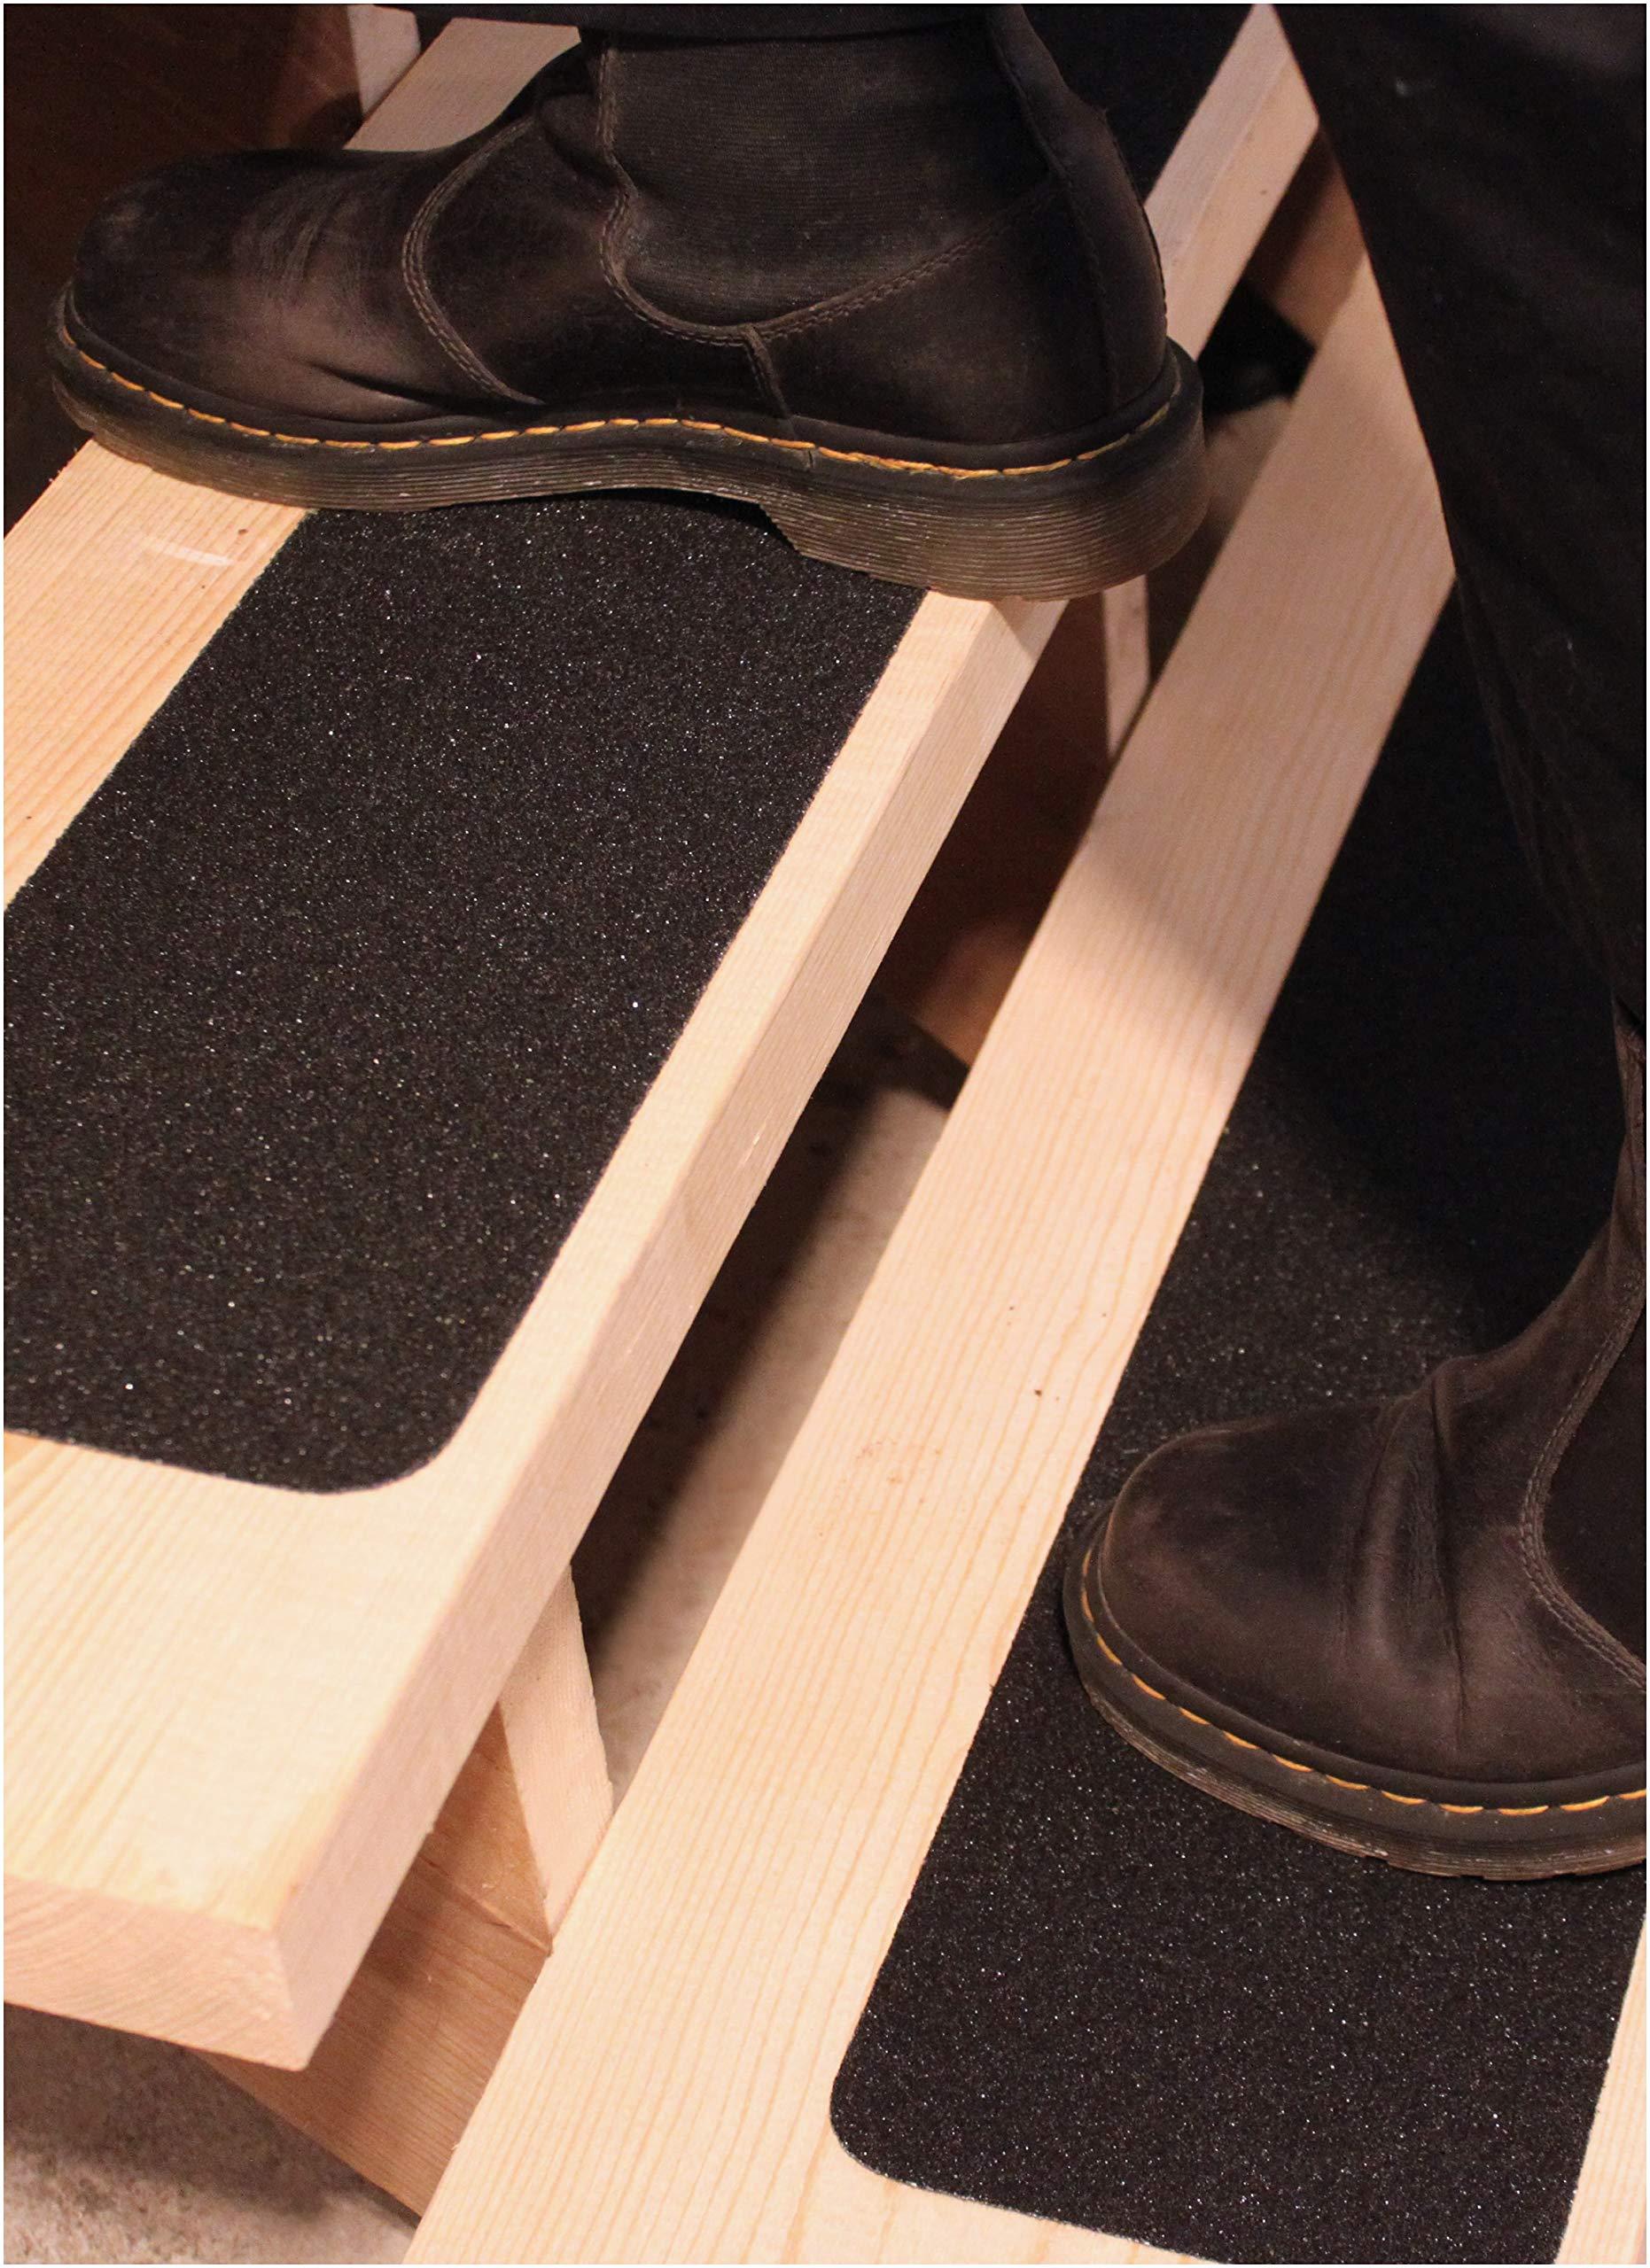 6''x40'' Stair Treads Non-Slip Outdoor Tape - (10-Pack) Black Anti-Slip Strips by Finehous